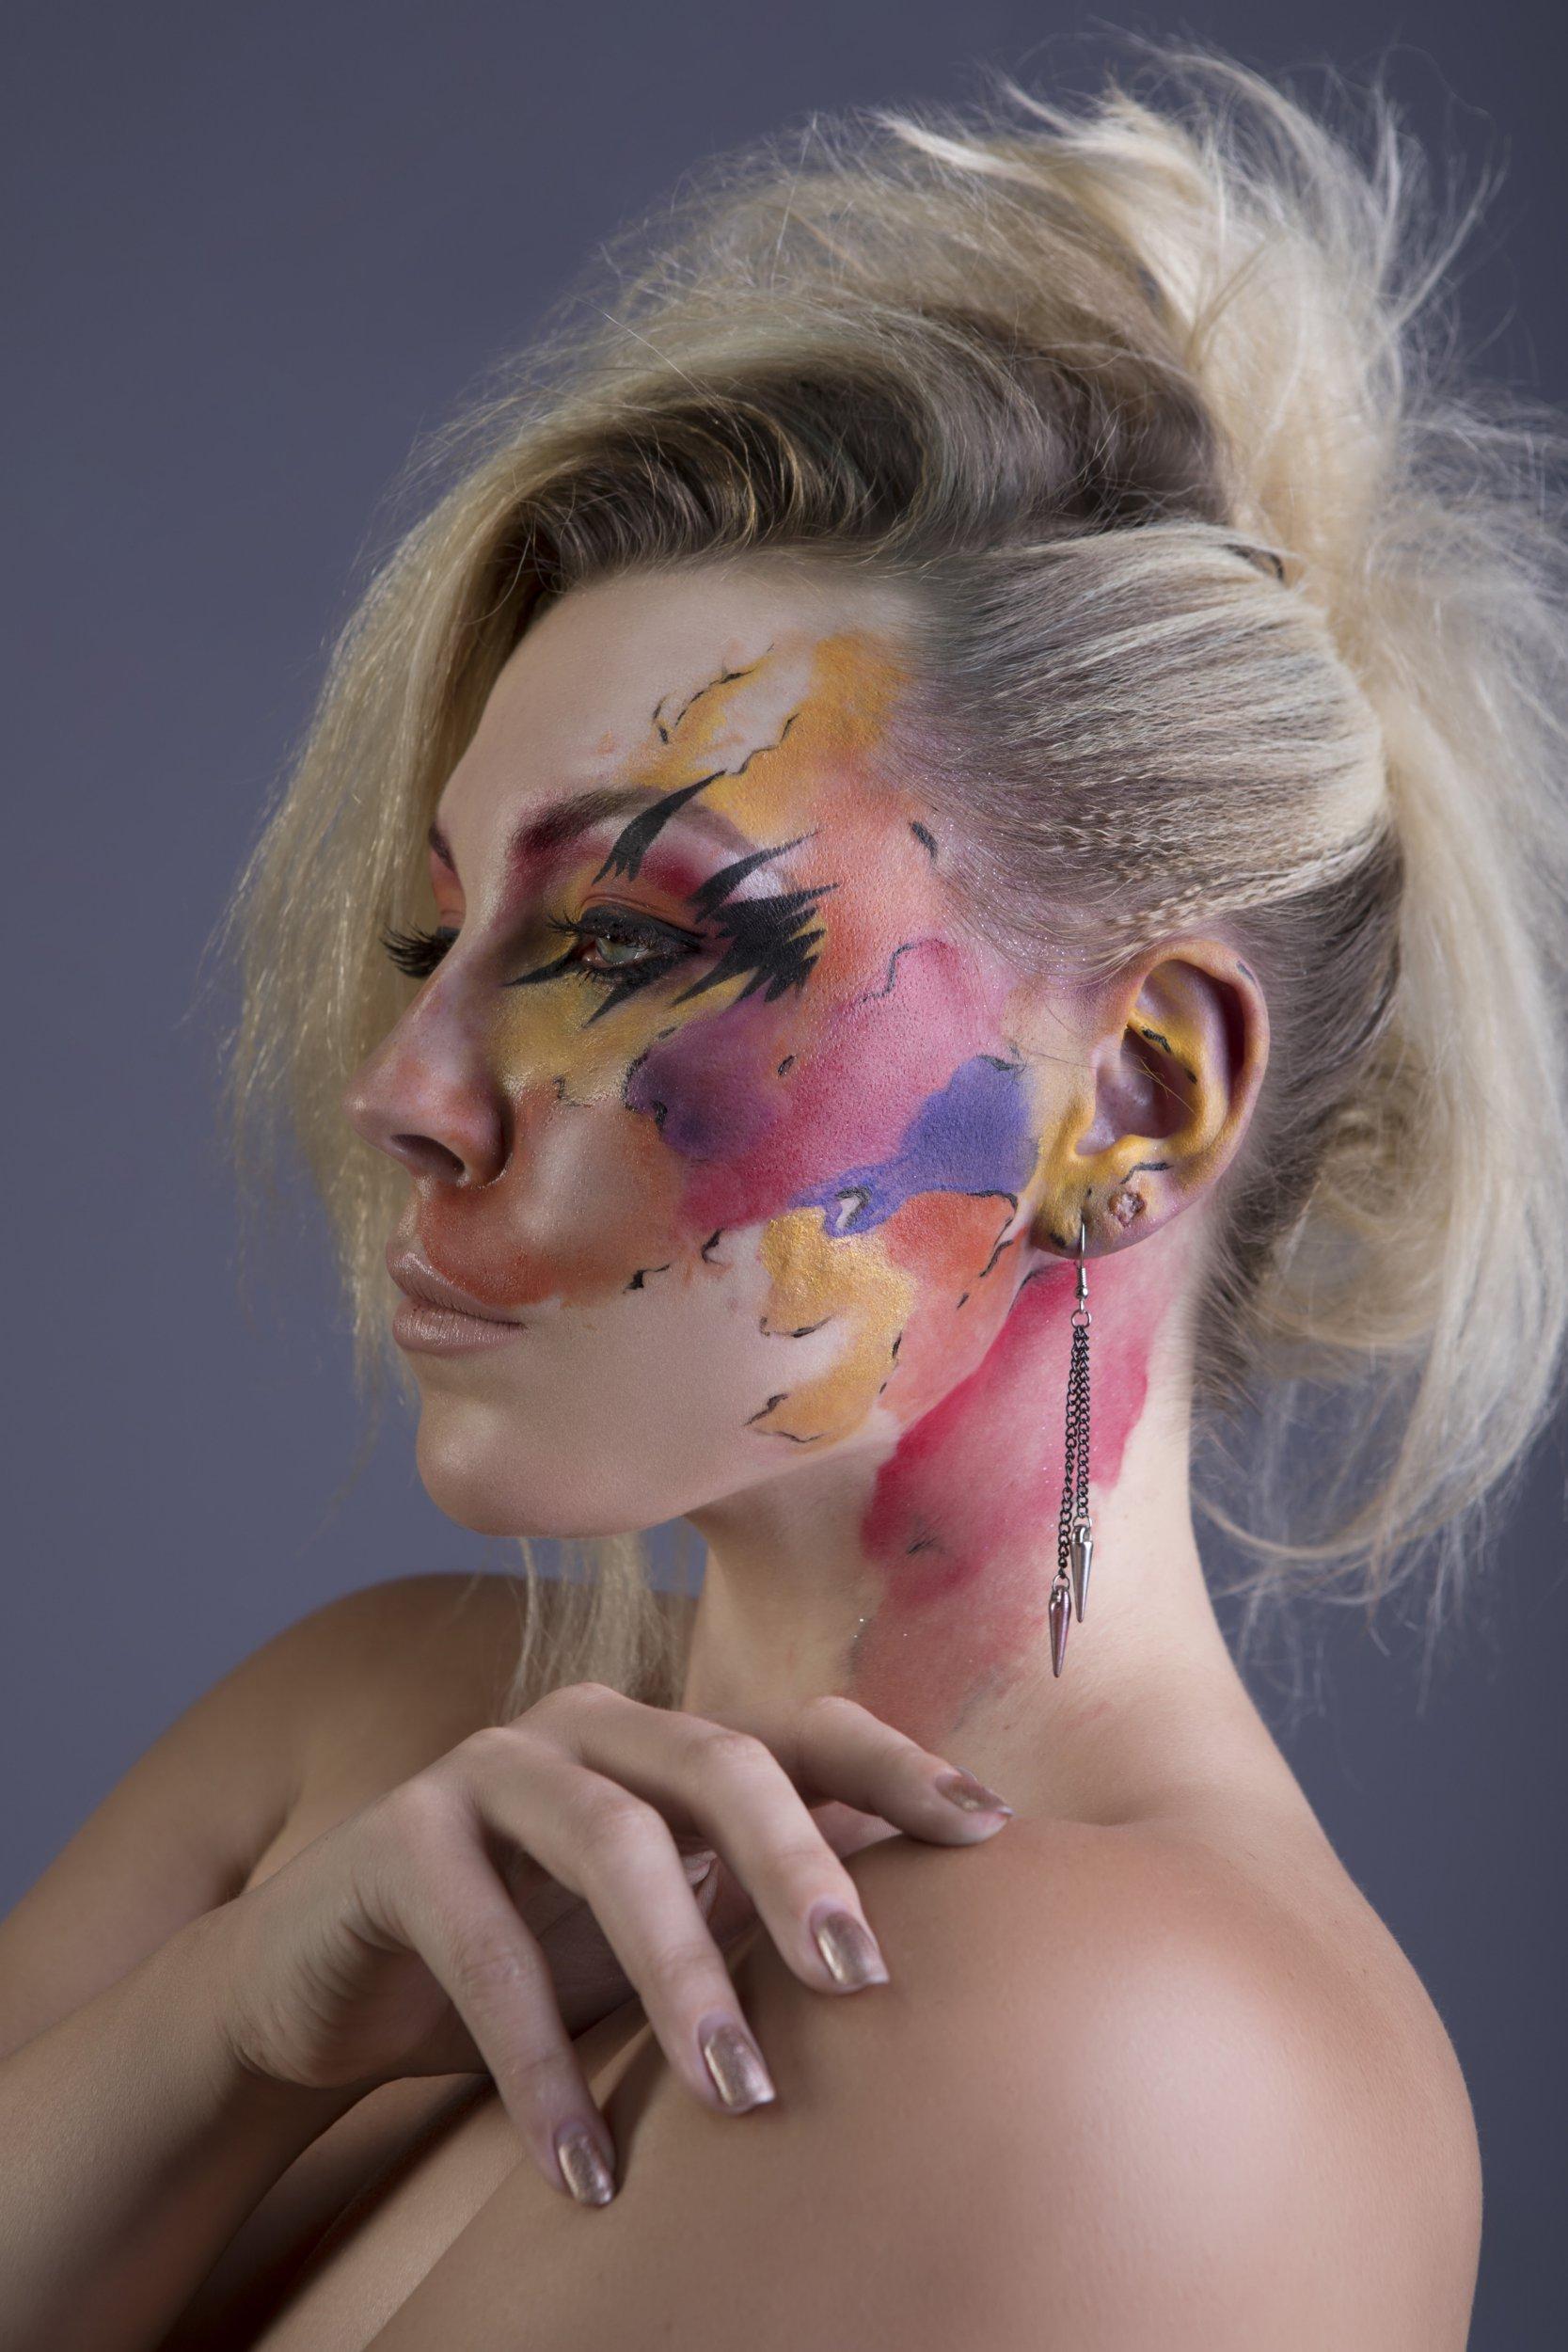 Actor bullied over large facial birthmark releases powerful photoseries